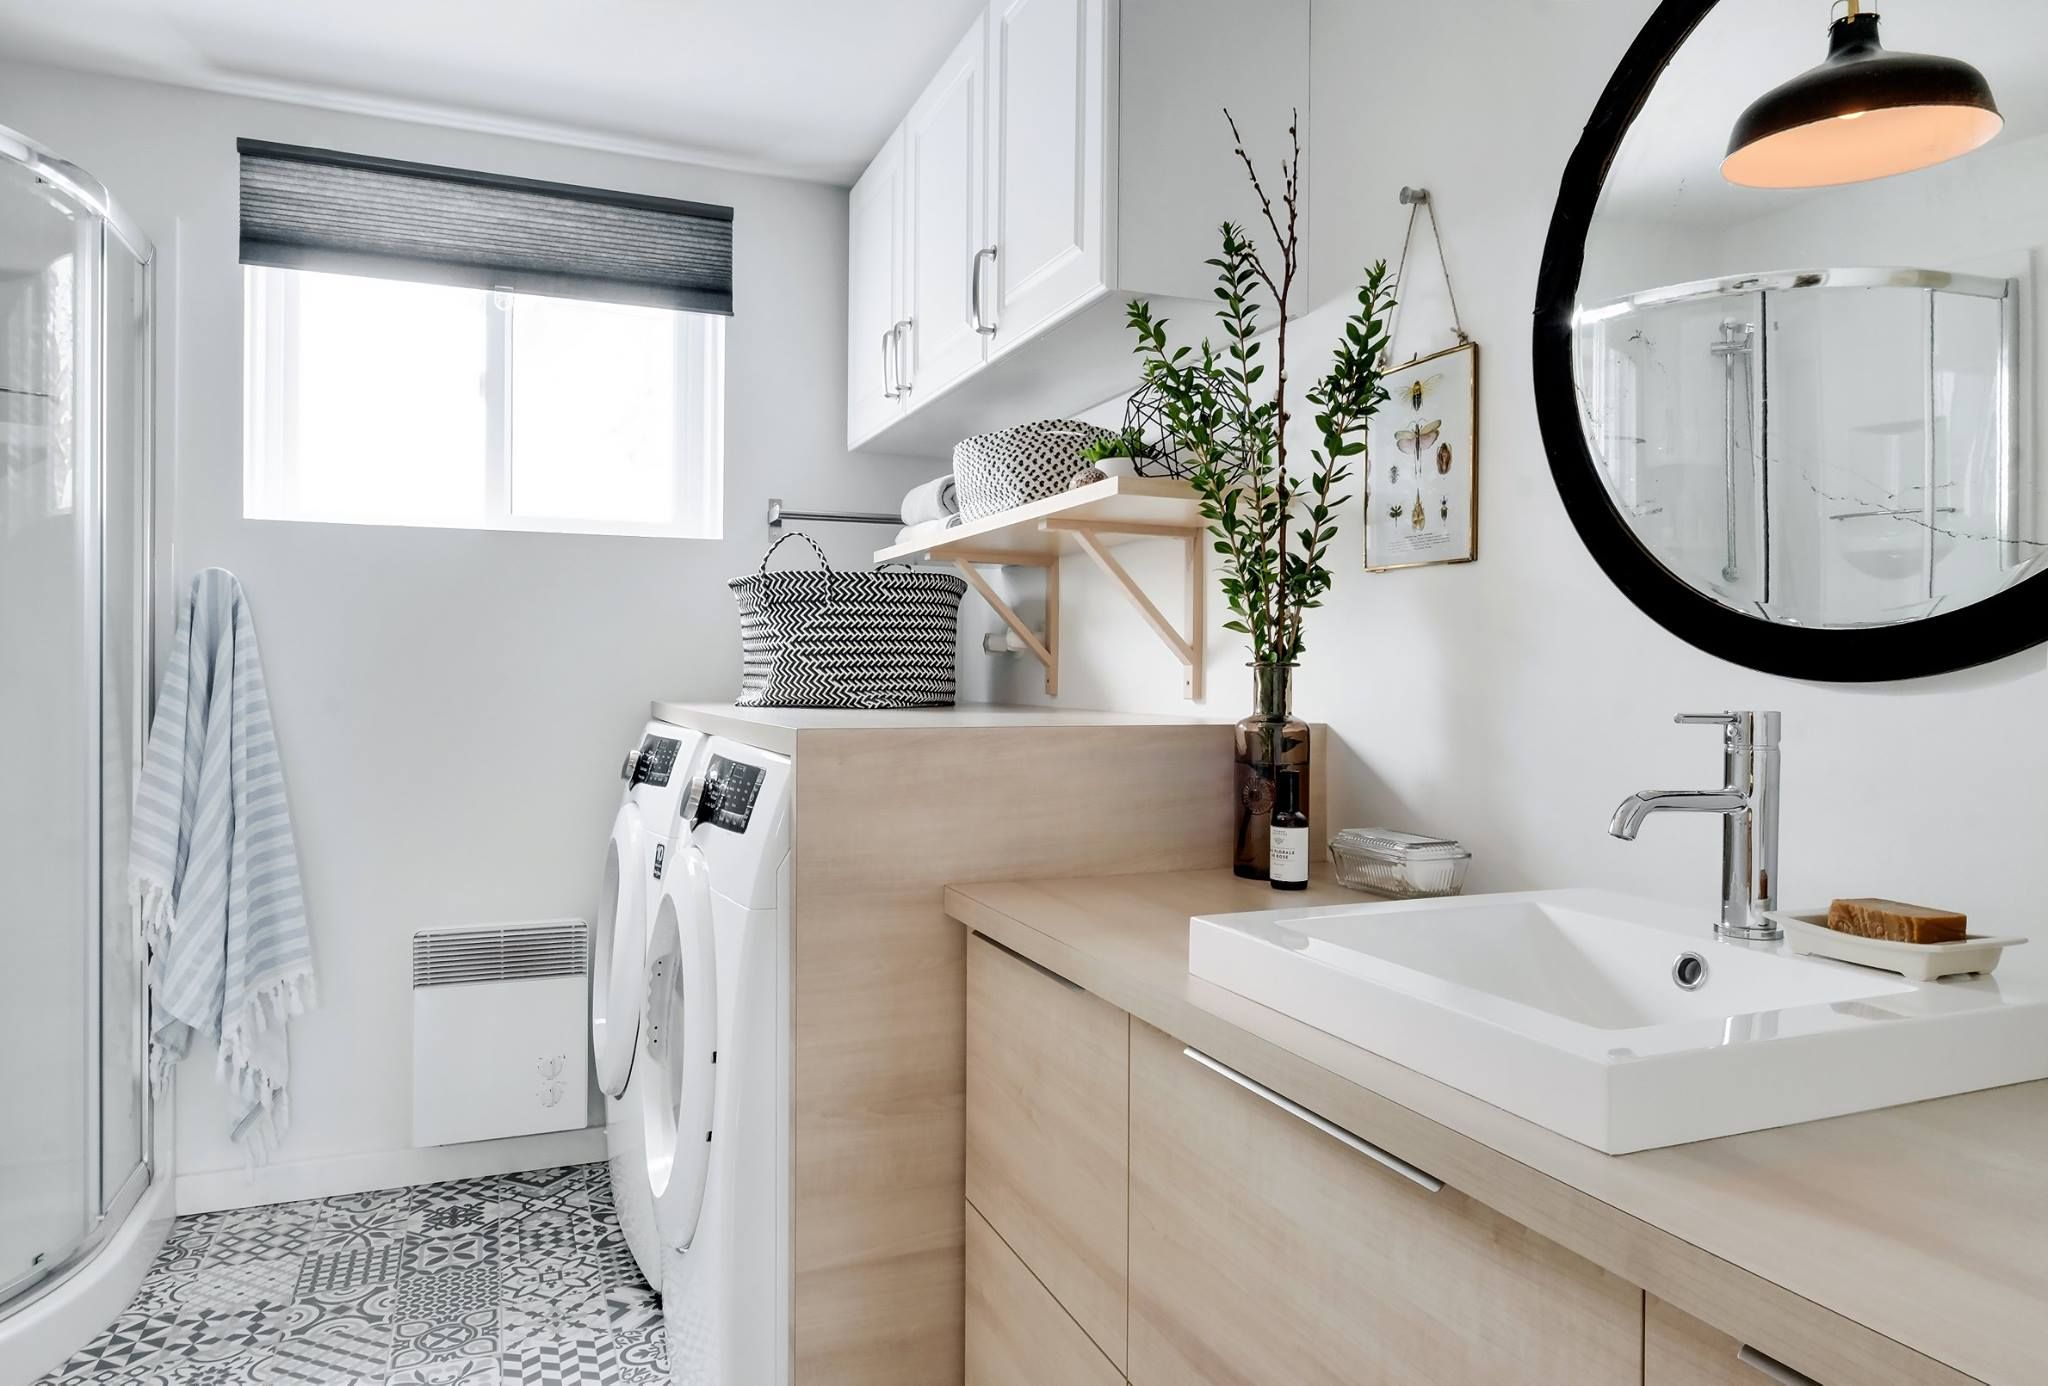 Consultez Notre Top 5 Salles De Lavage Ici Une Realisation De Andreanne Allard Designer Large Bathrooms Very Small Bathroom Bathroom Styling